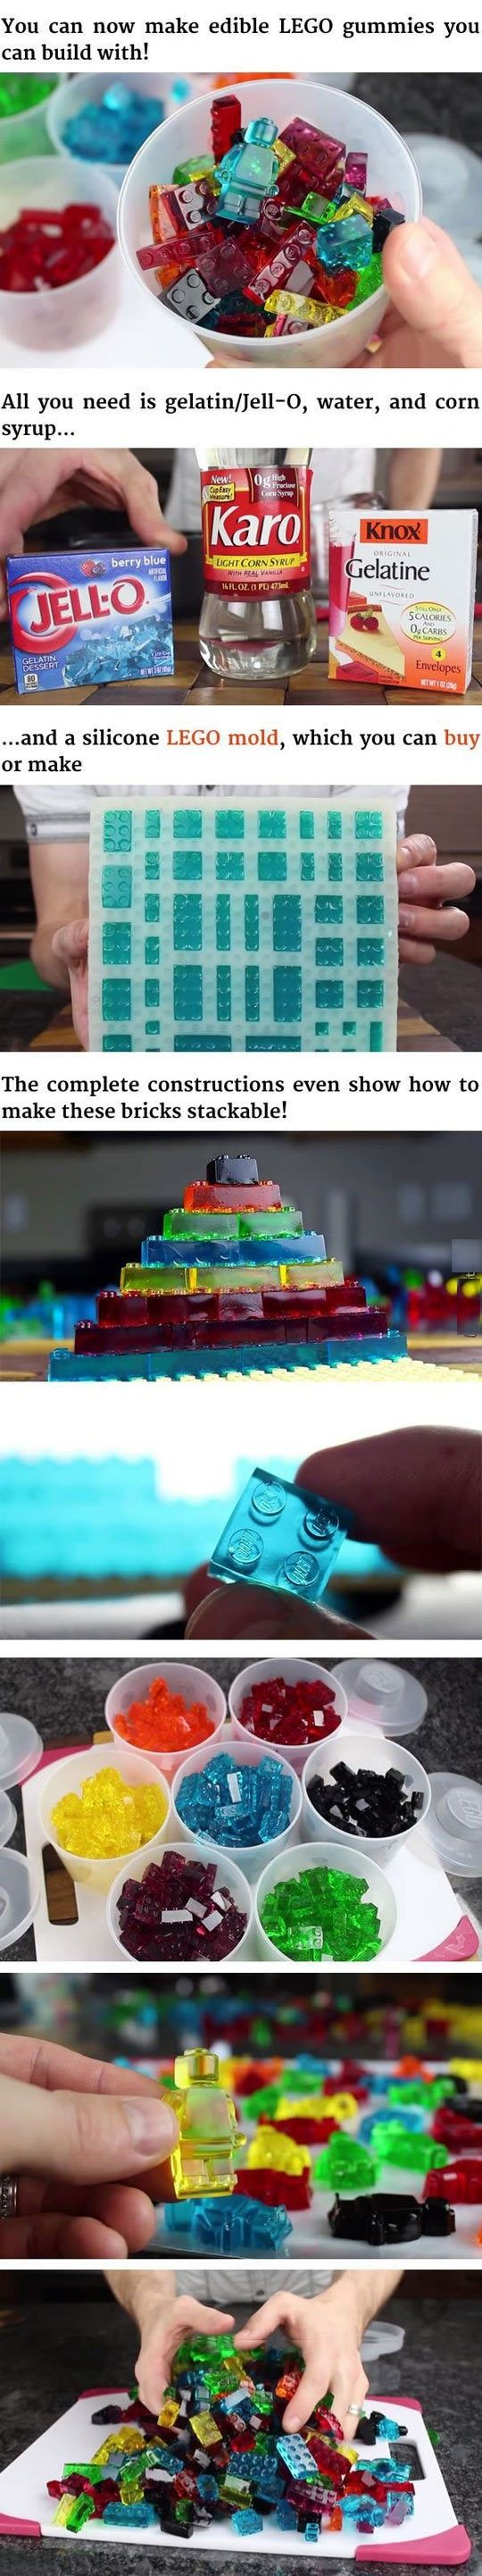 Edible LEGO. WANT!